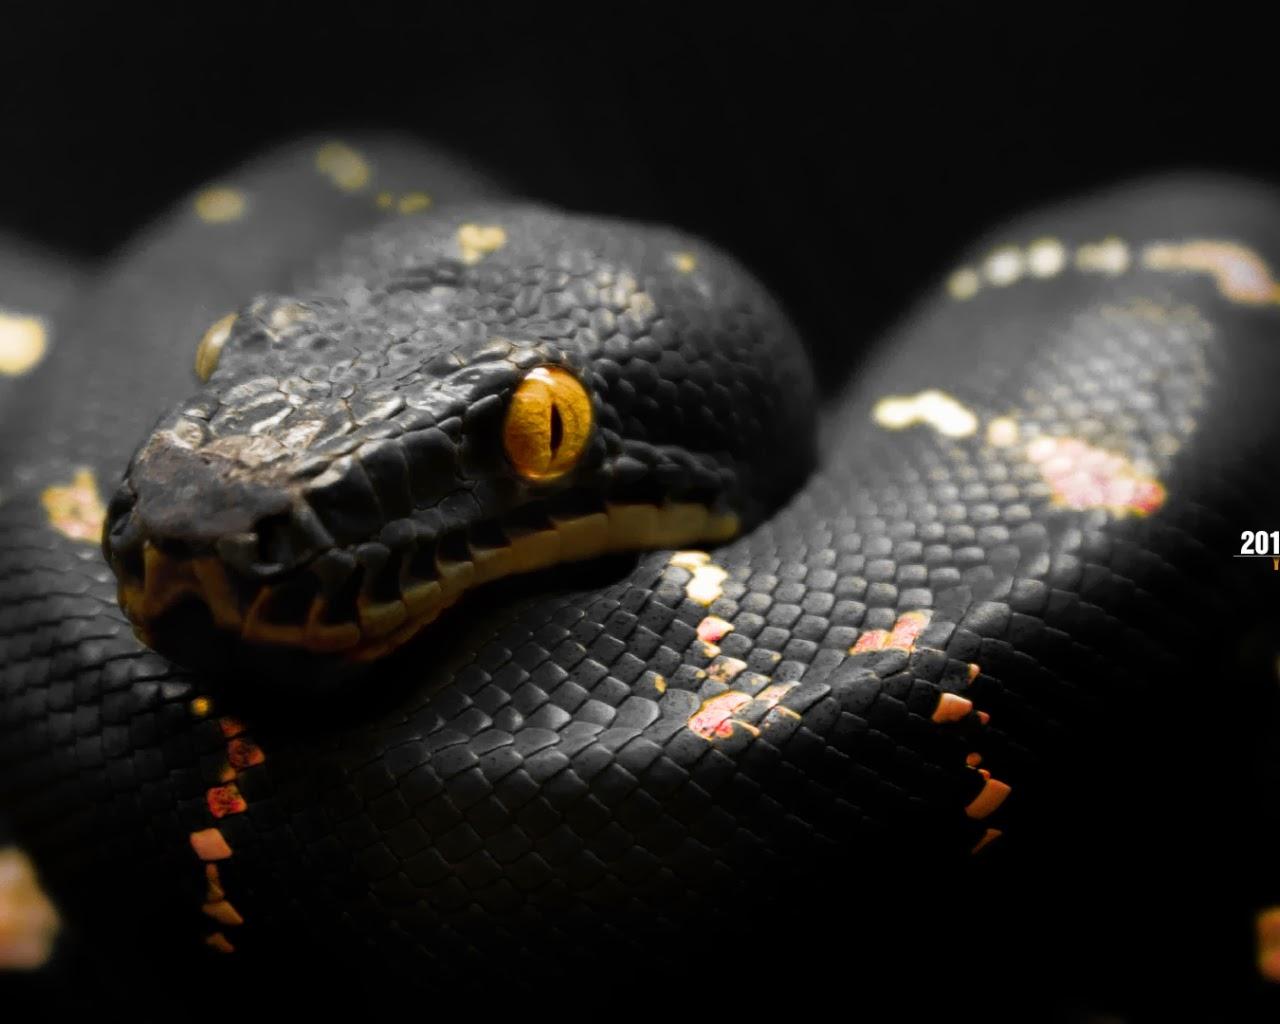 World Best Dangerous Snake HD Wallpapers HD Wallpapers Blog